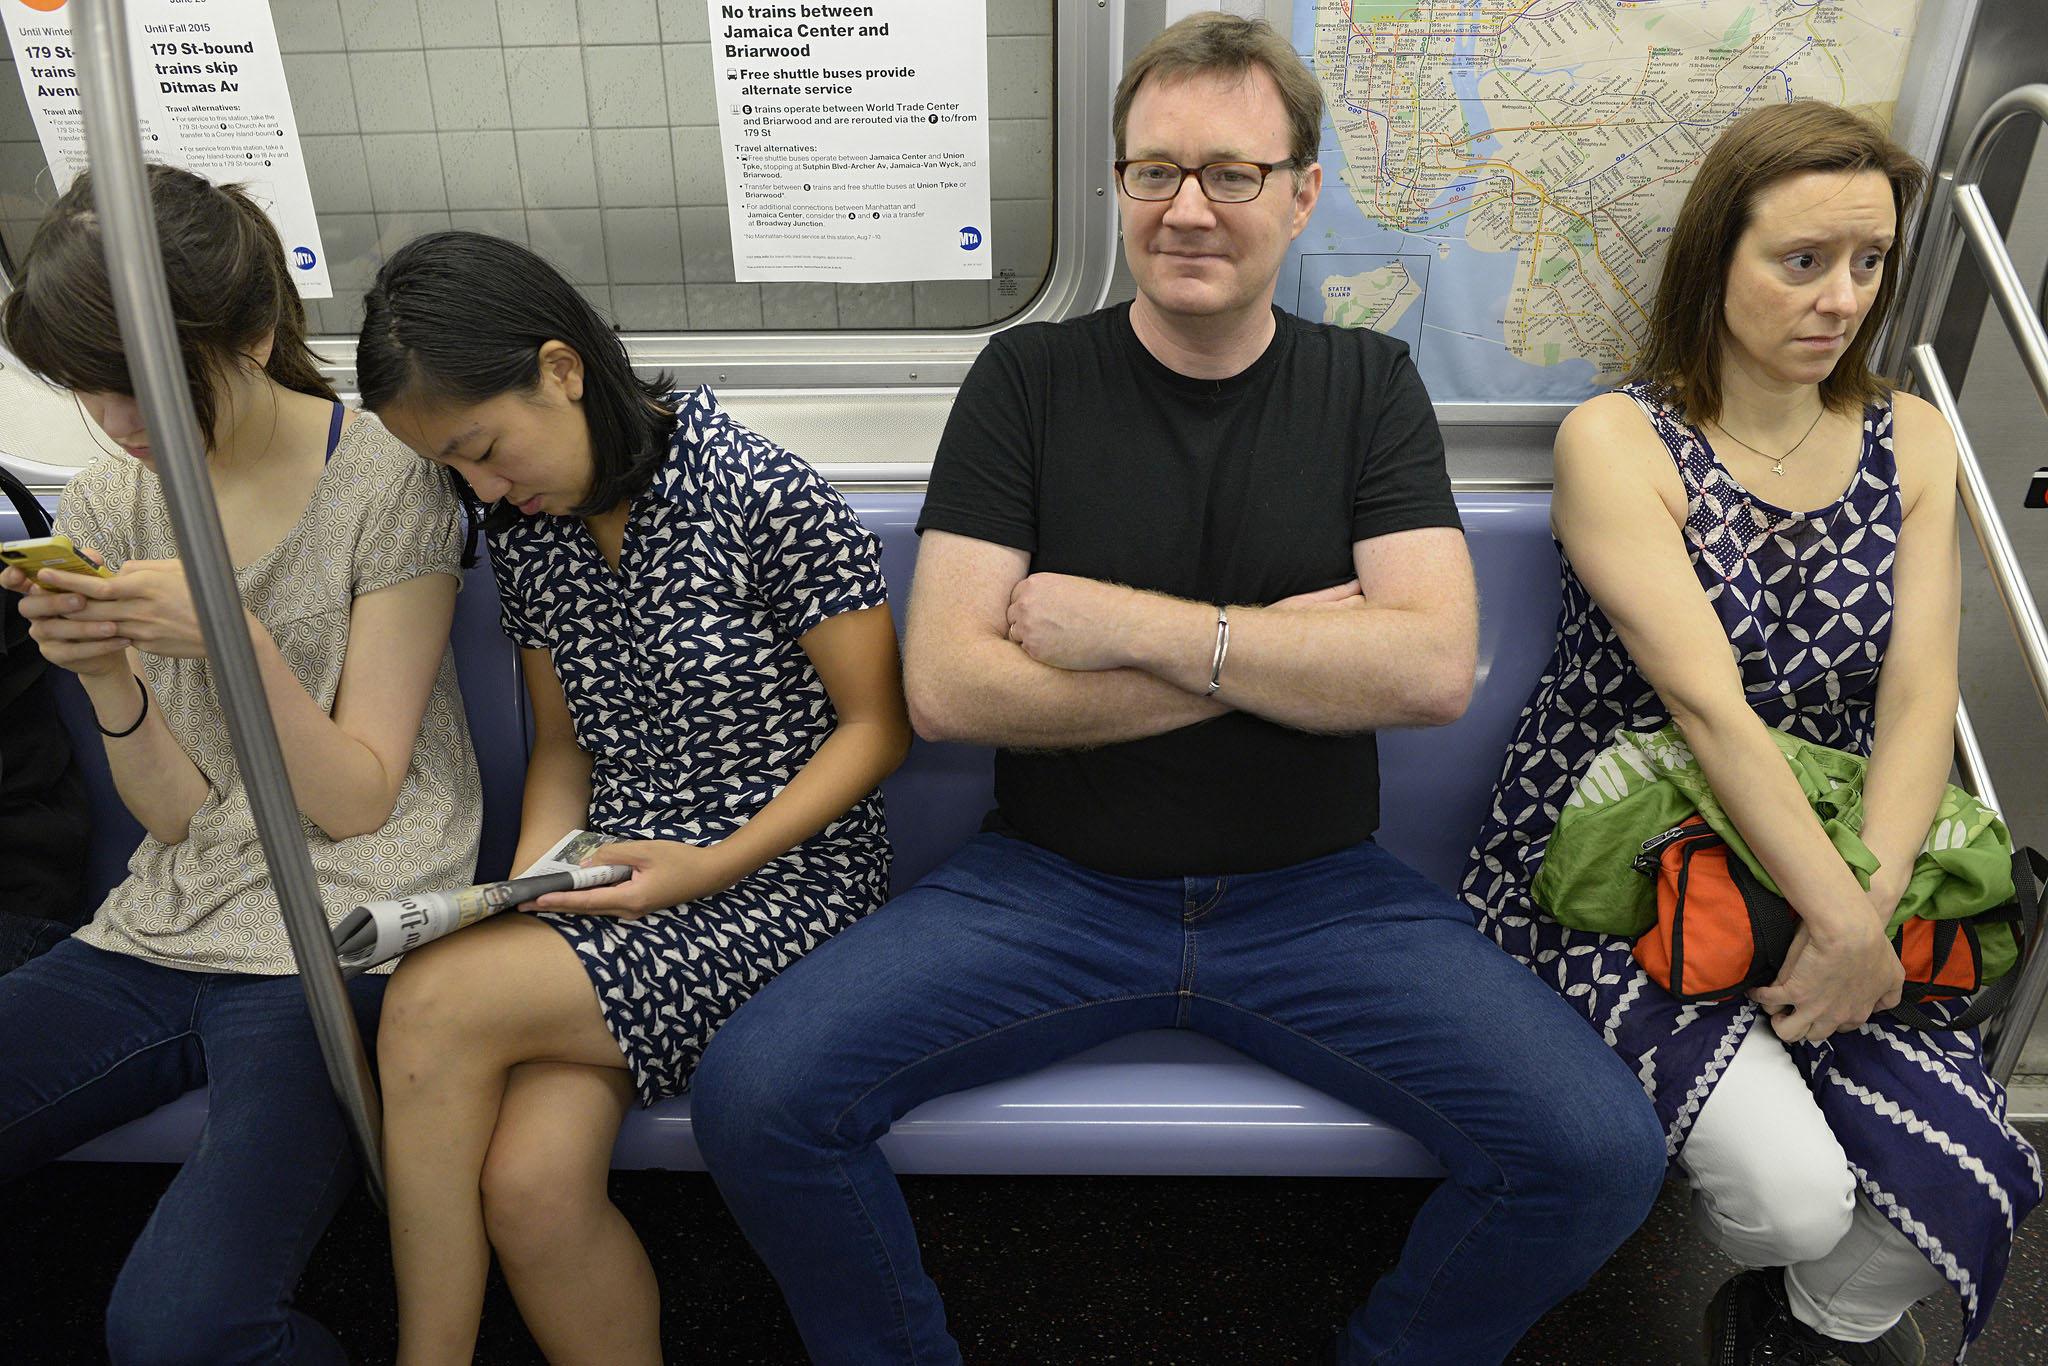 Manspreading on a subway car. (Photo: Richard Yeh / WNYC)